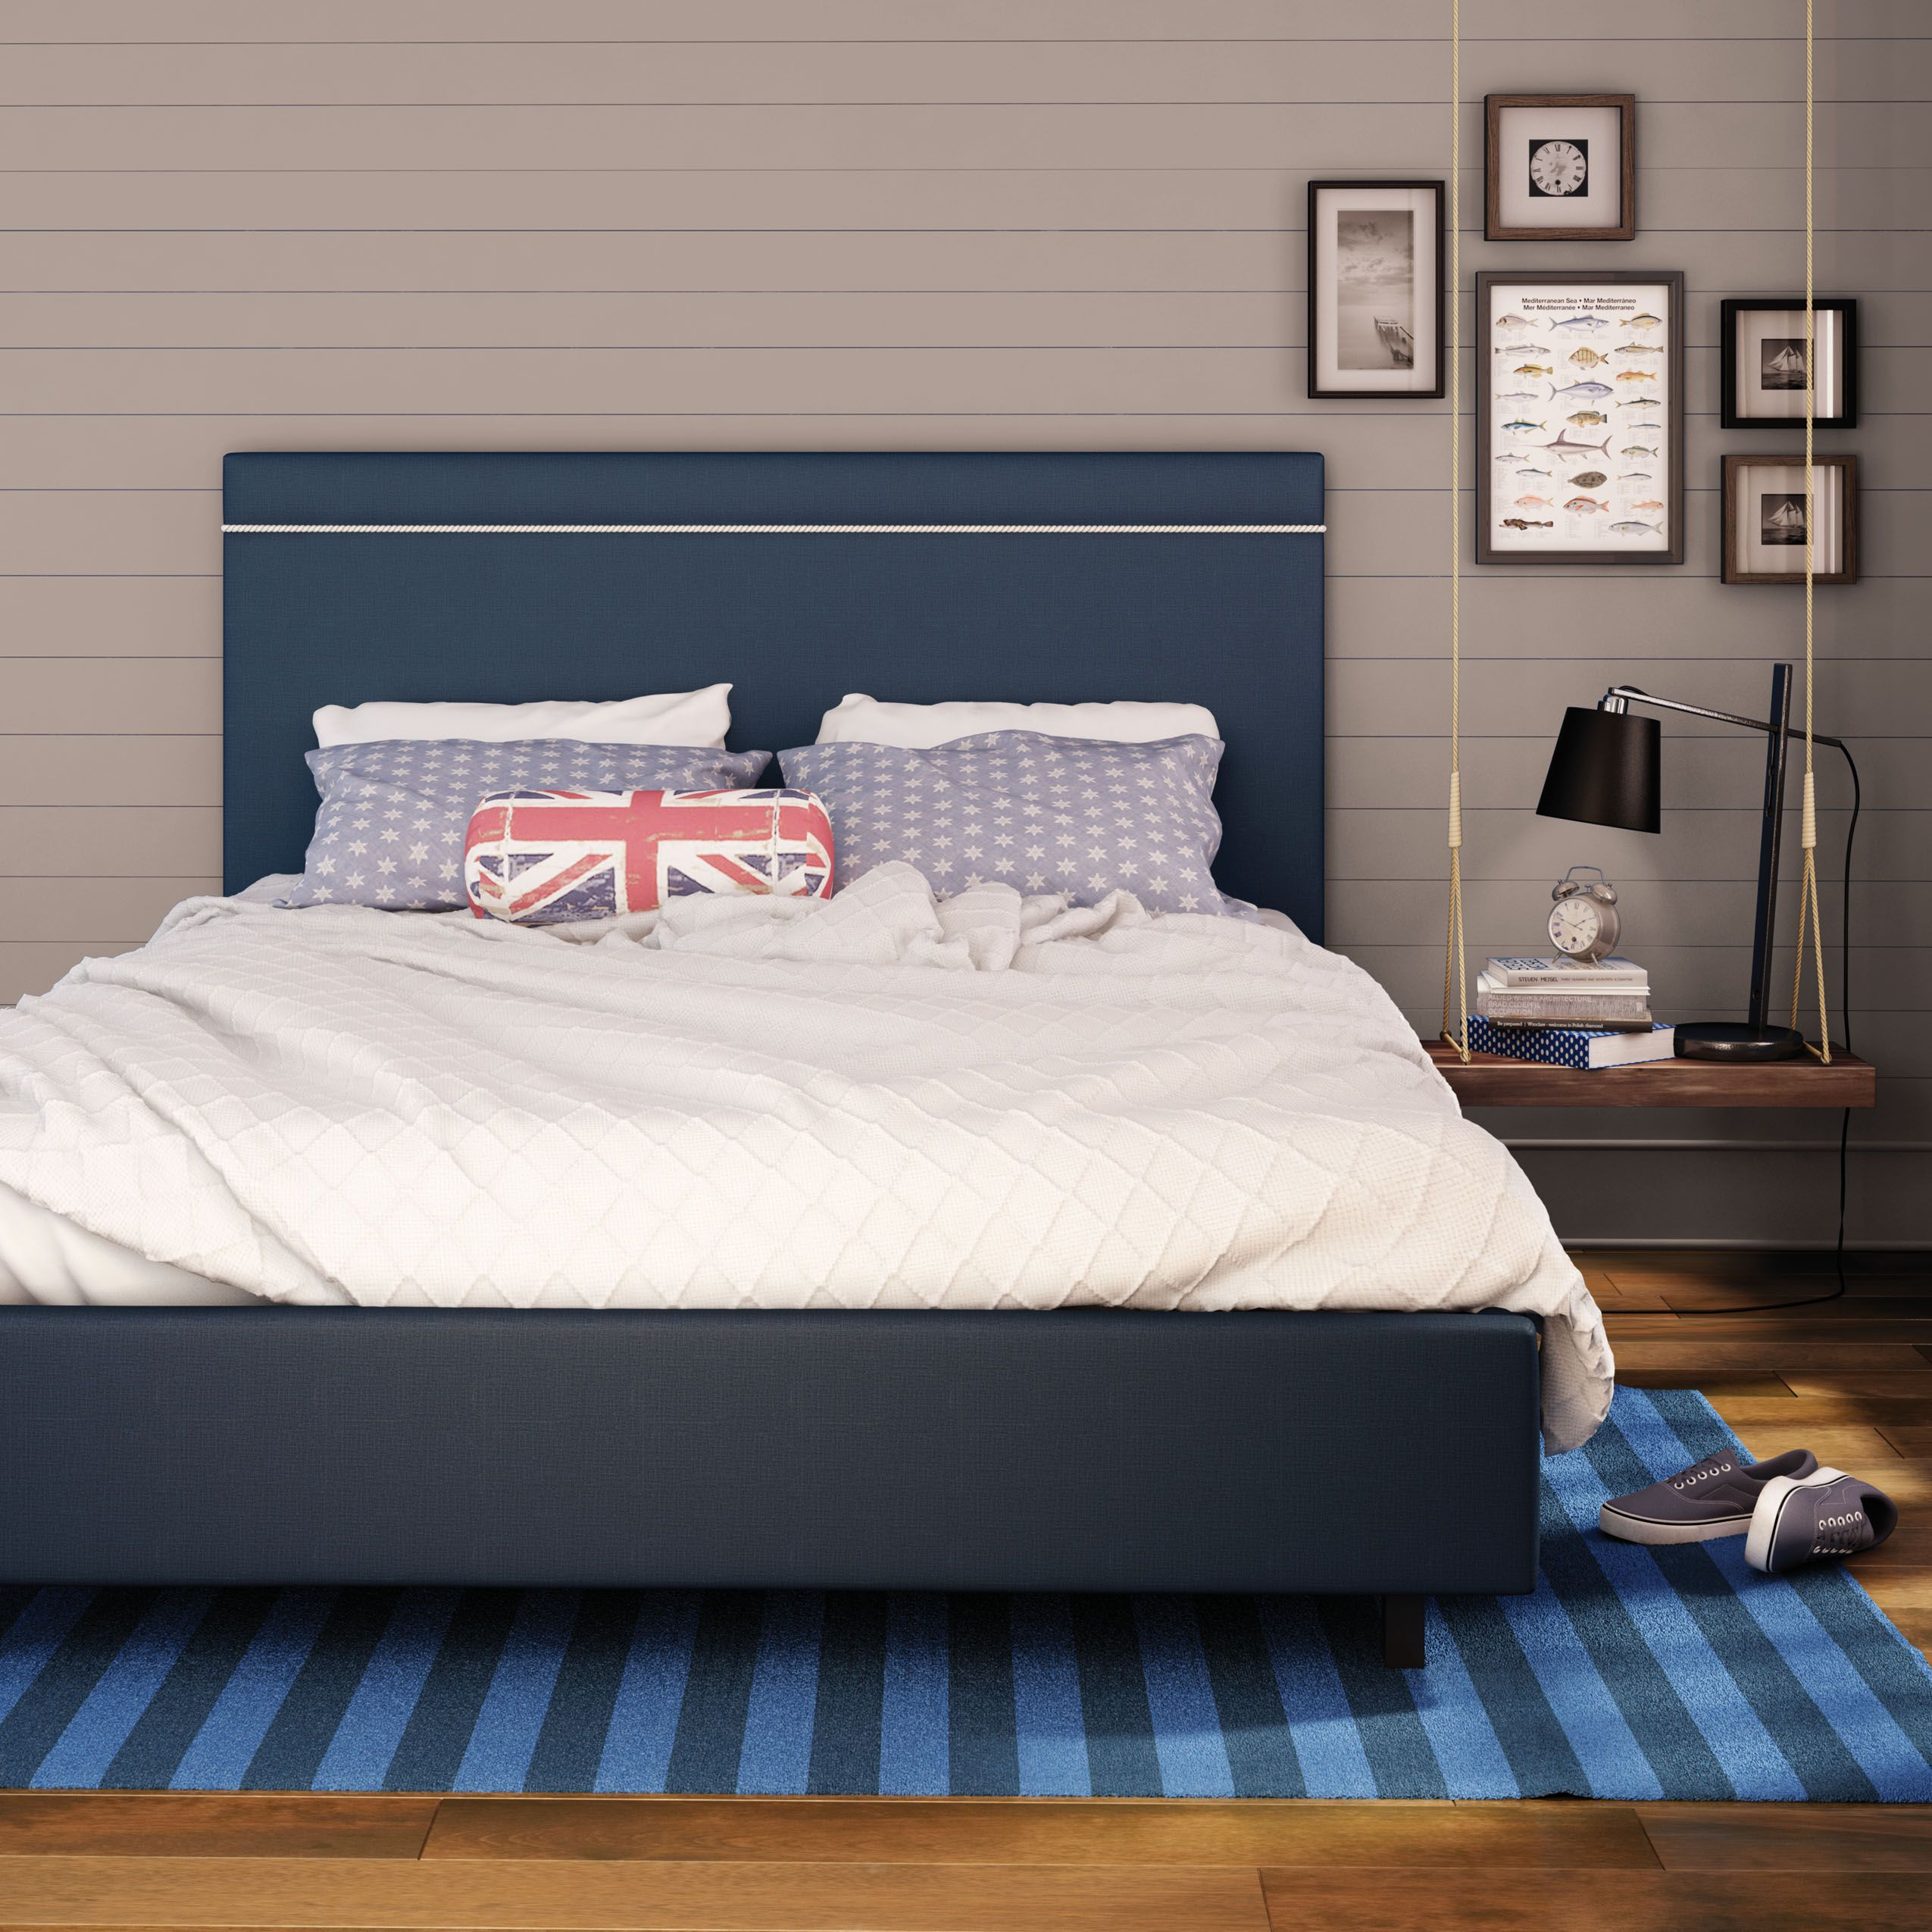 Amisco breeze bed 12504c furniture bedroom urban - Show me pictures of bunk beds ...